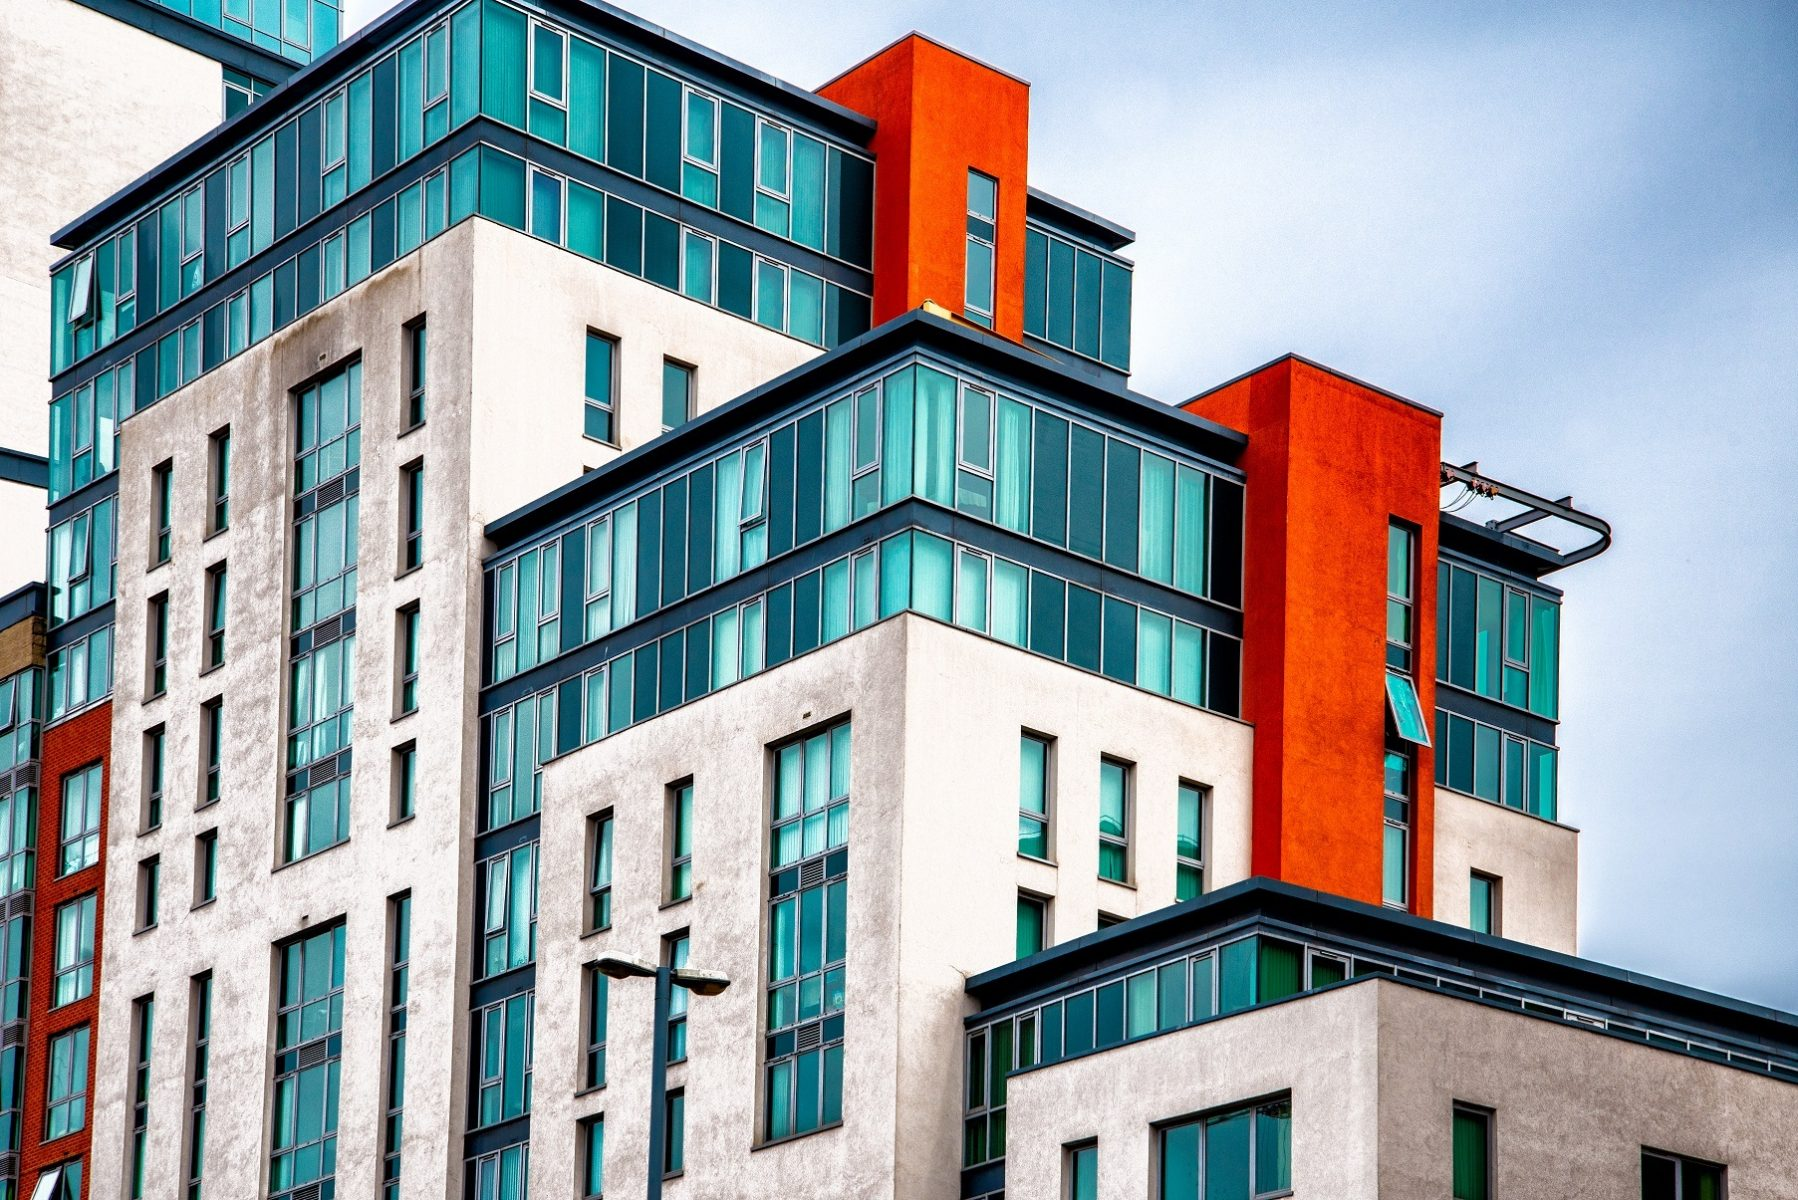 Rental supply is down - apartments in Bimingham